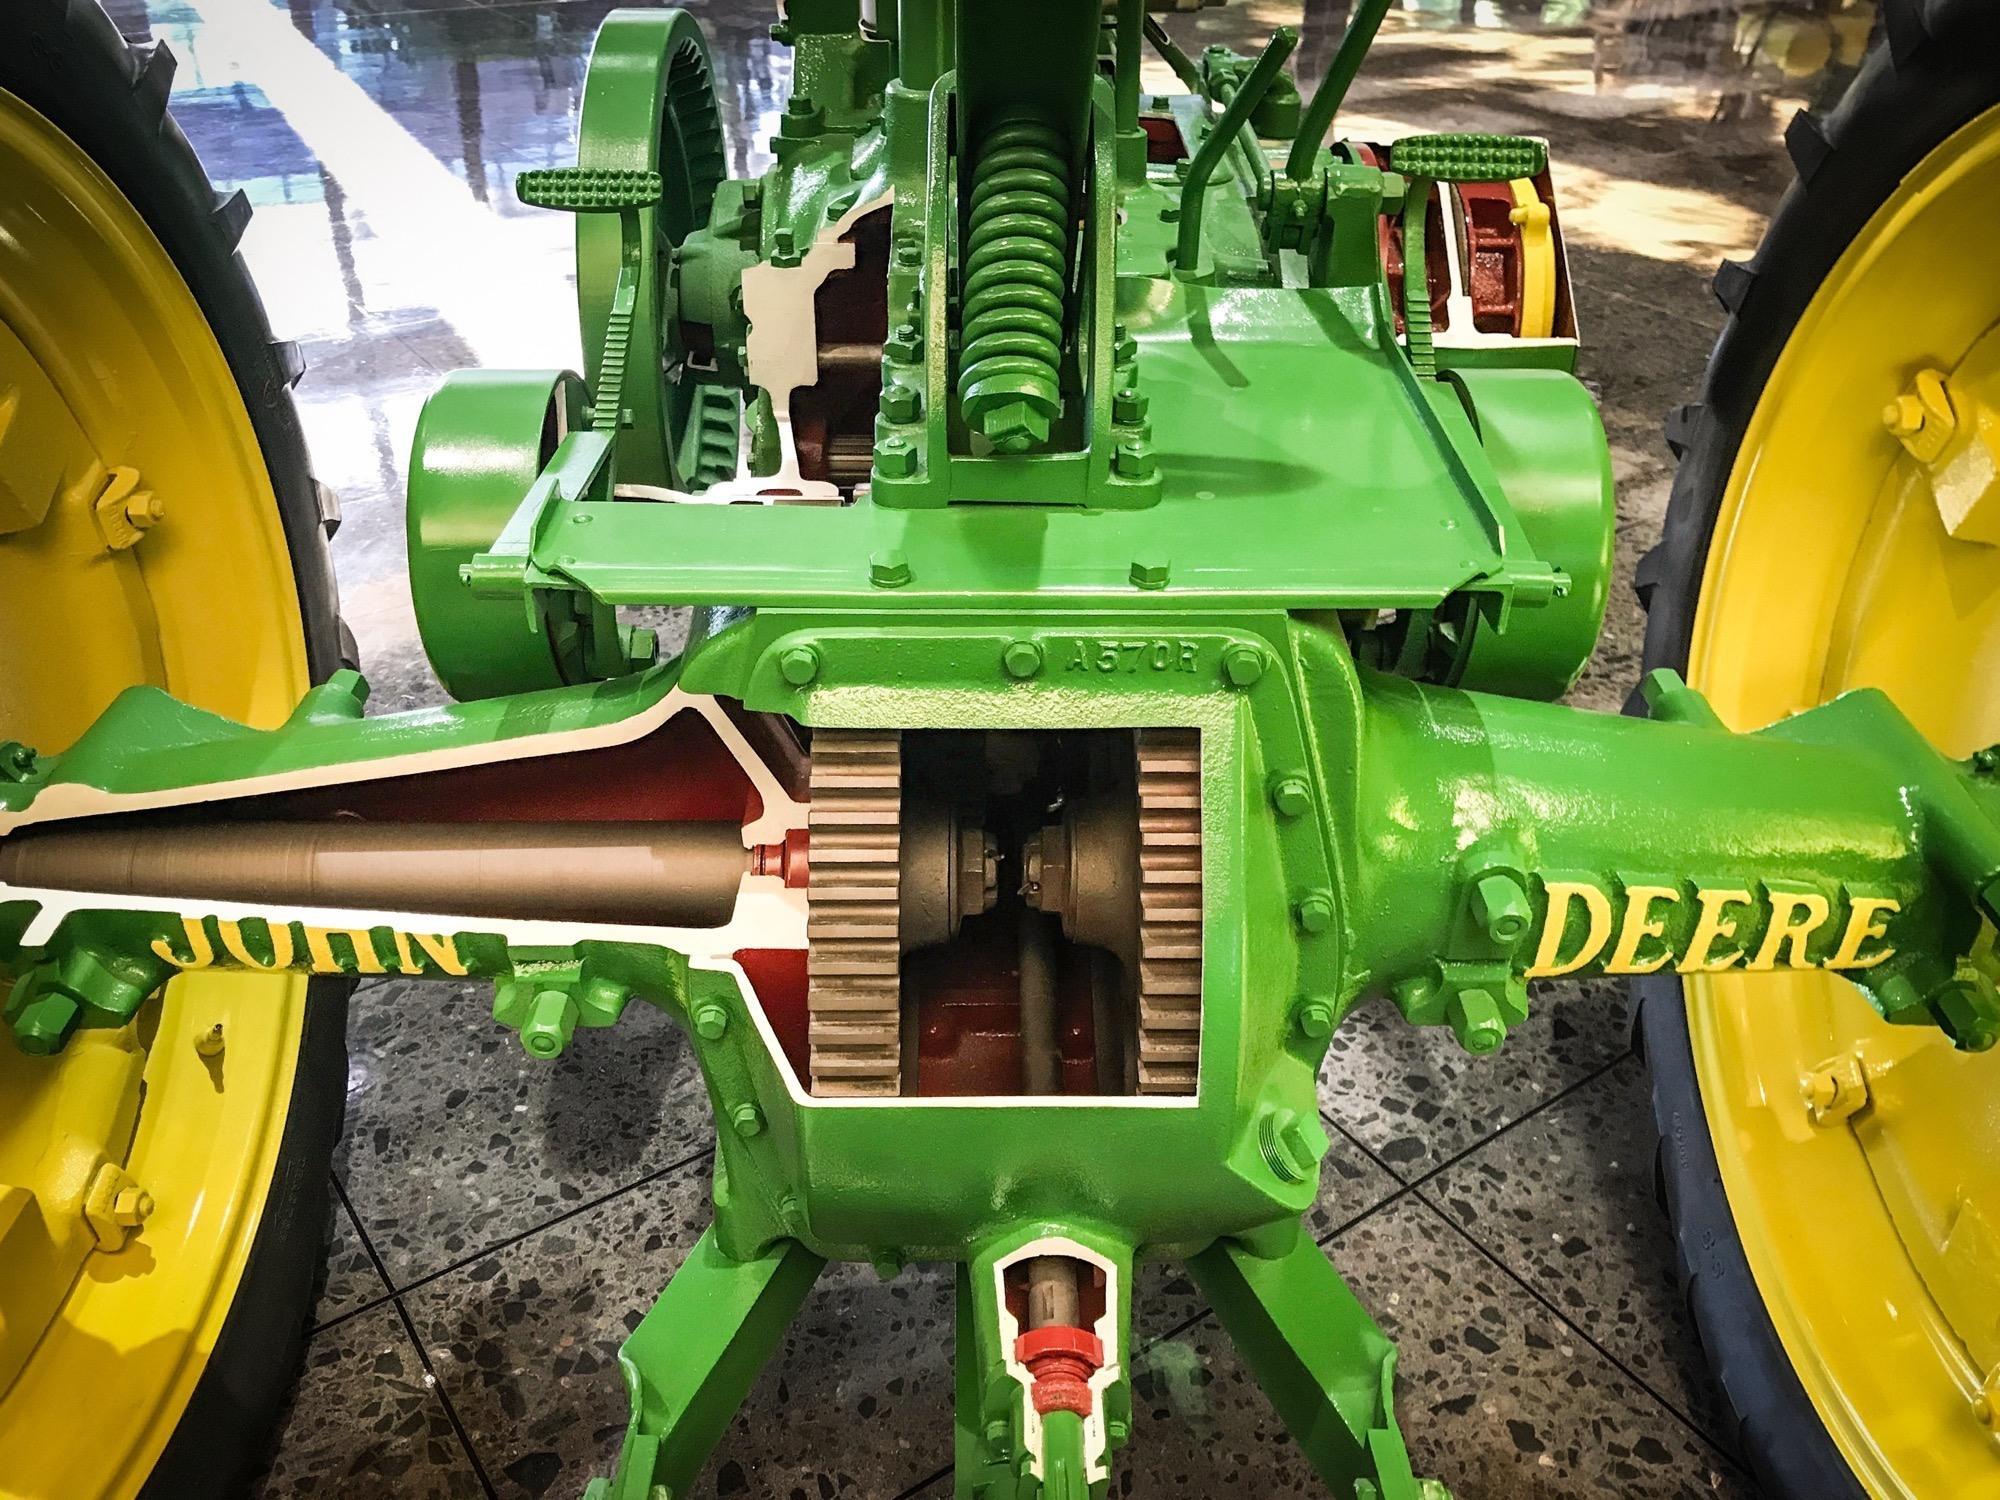 The Oldest John Deere : Photos classic american machines on display at john deere